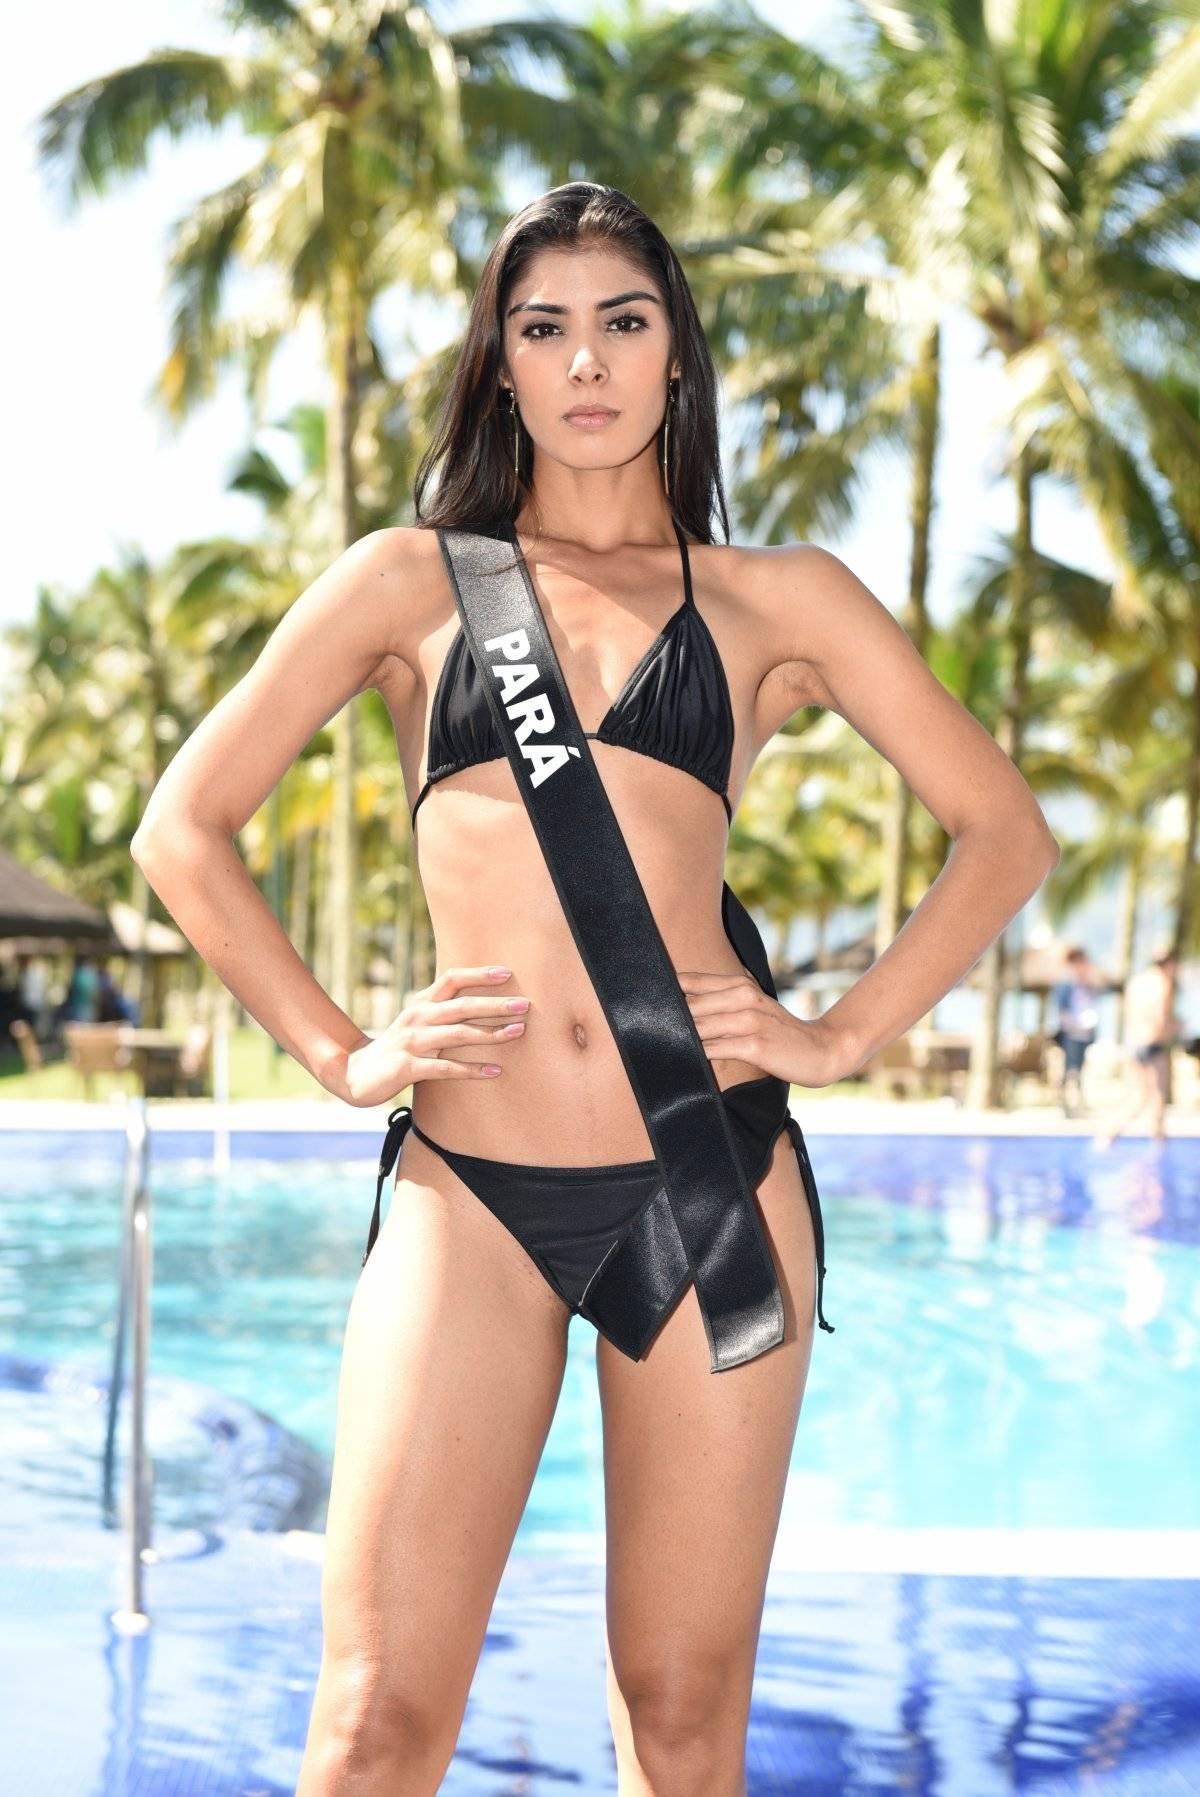 Miss Pará Ponnyk Torres Rodrigo Trevisan/Divulgação